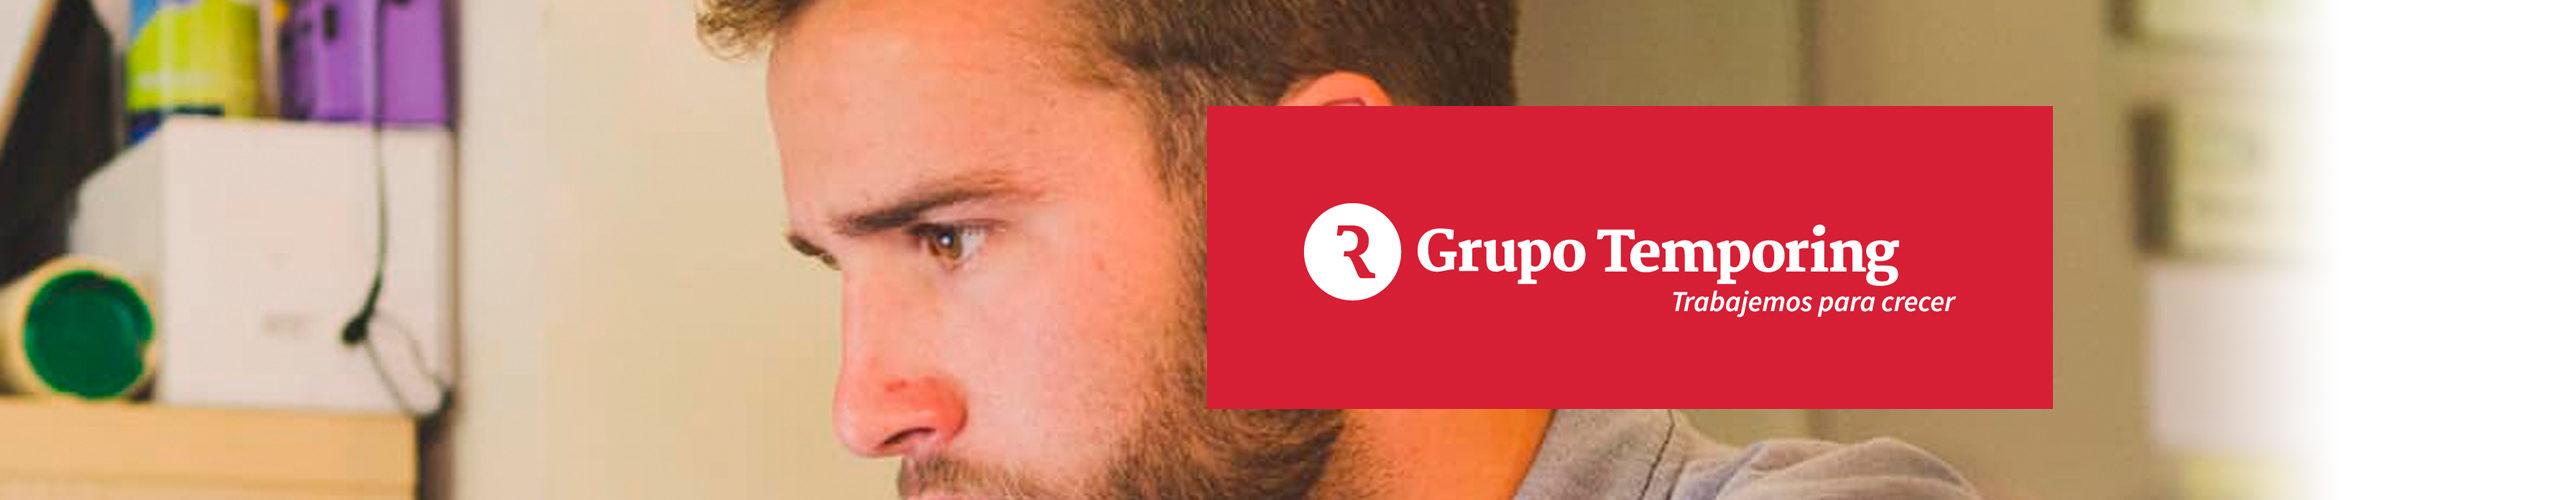 Blog Grupo Temporing